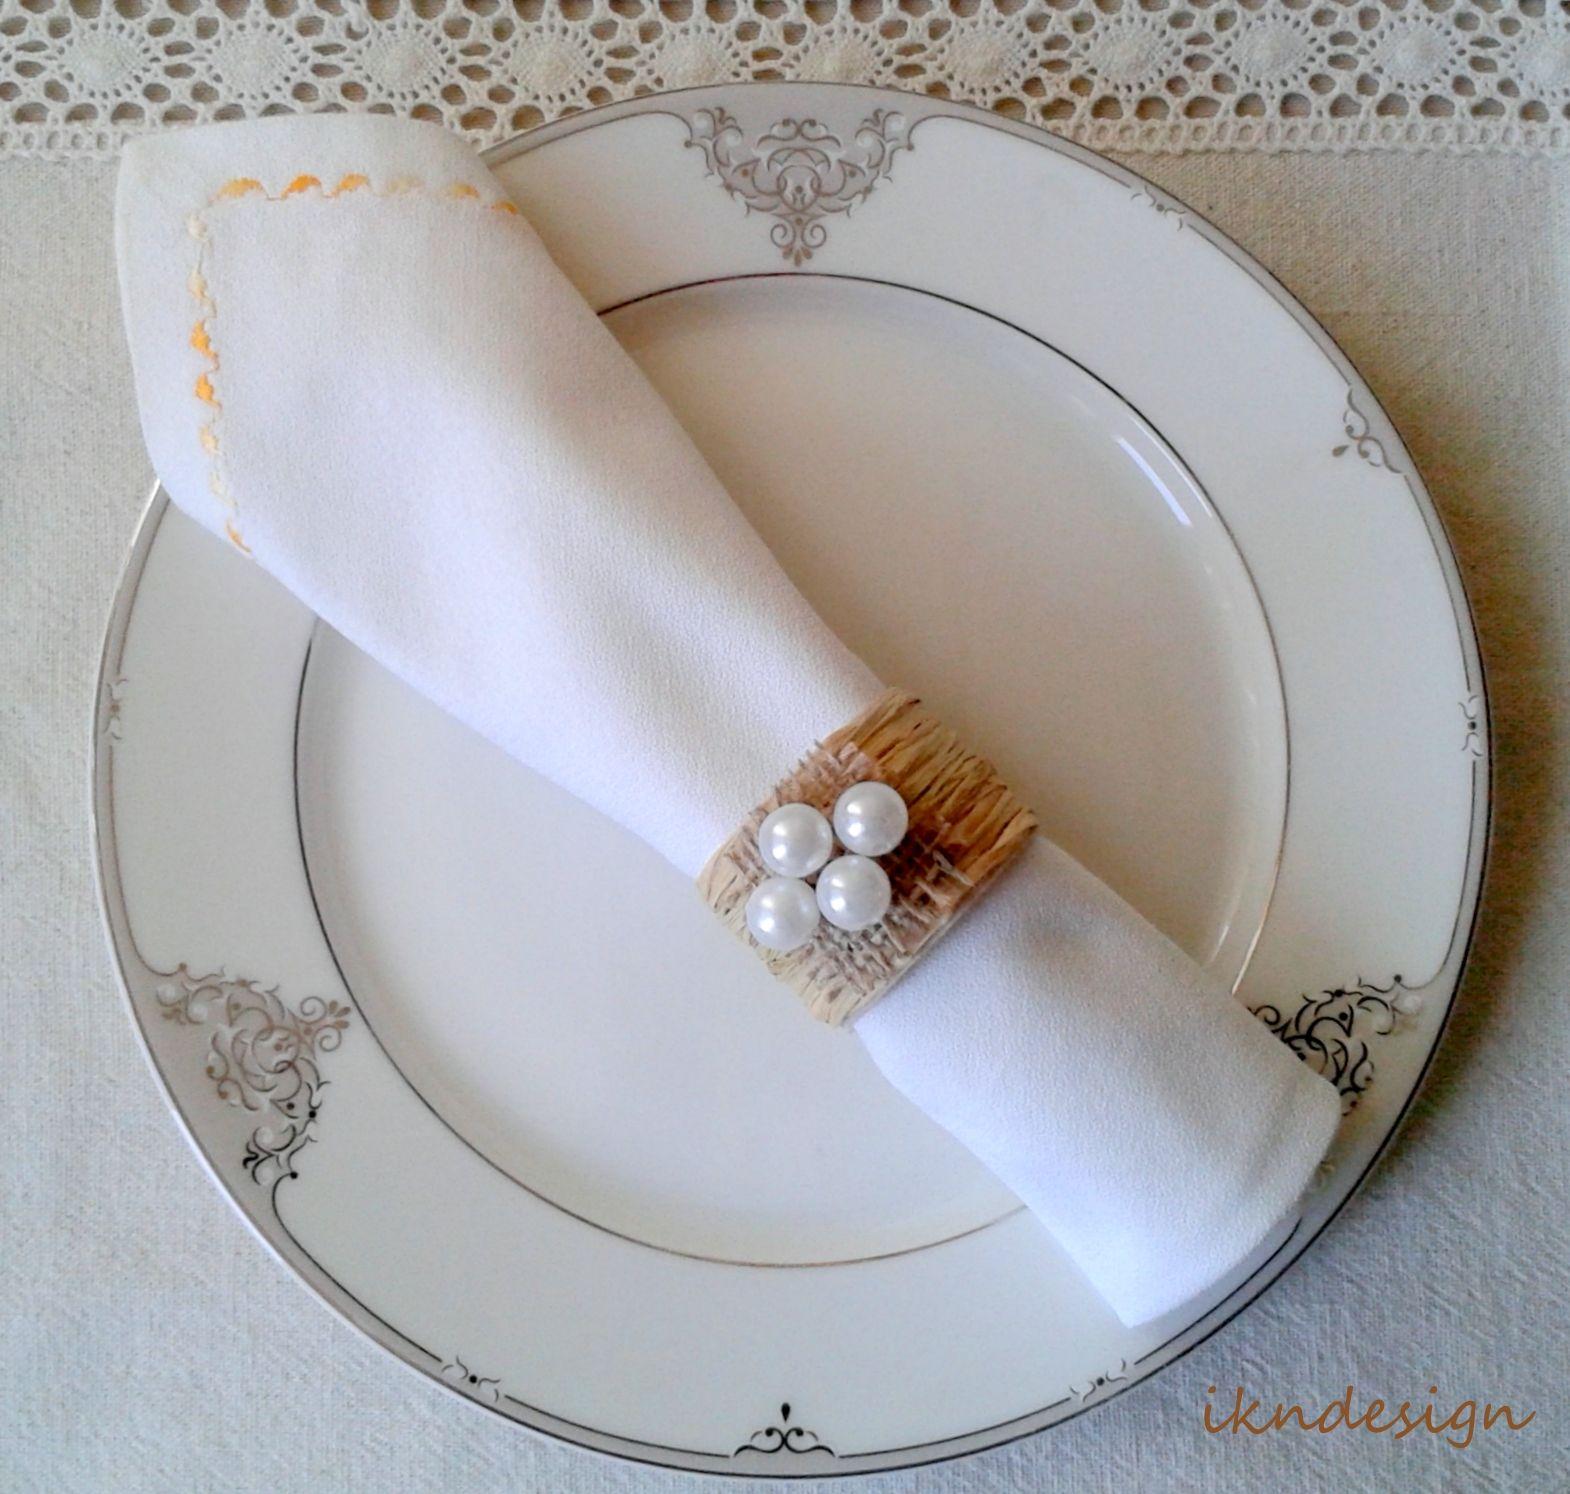 peçete halkası- napkin ring http://ikndesign.com/?p=645